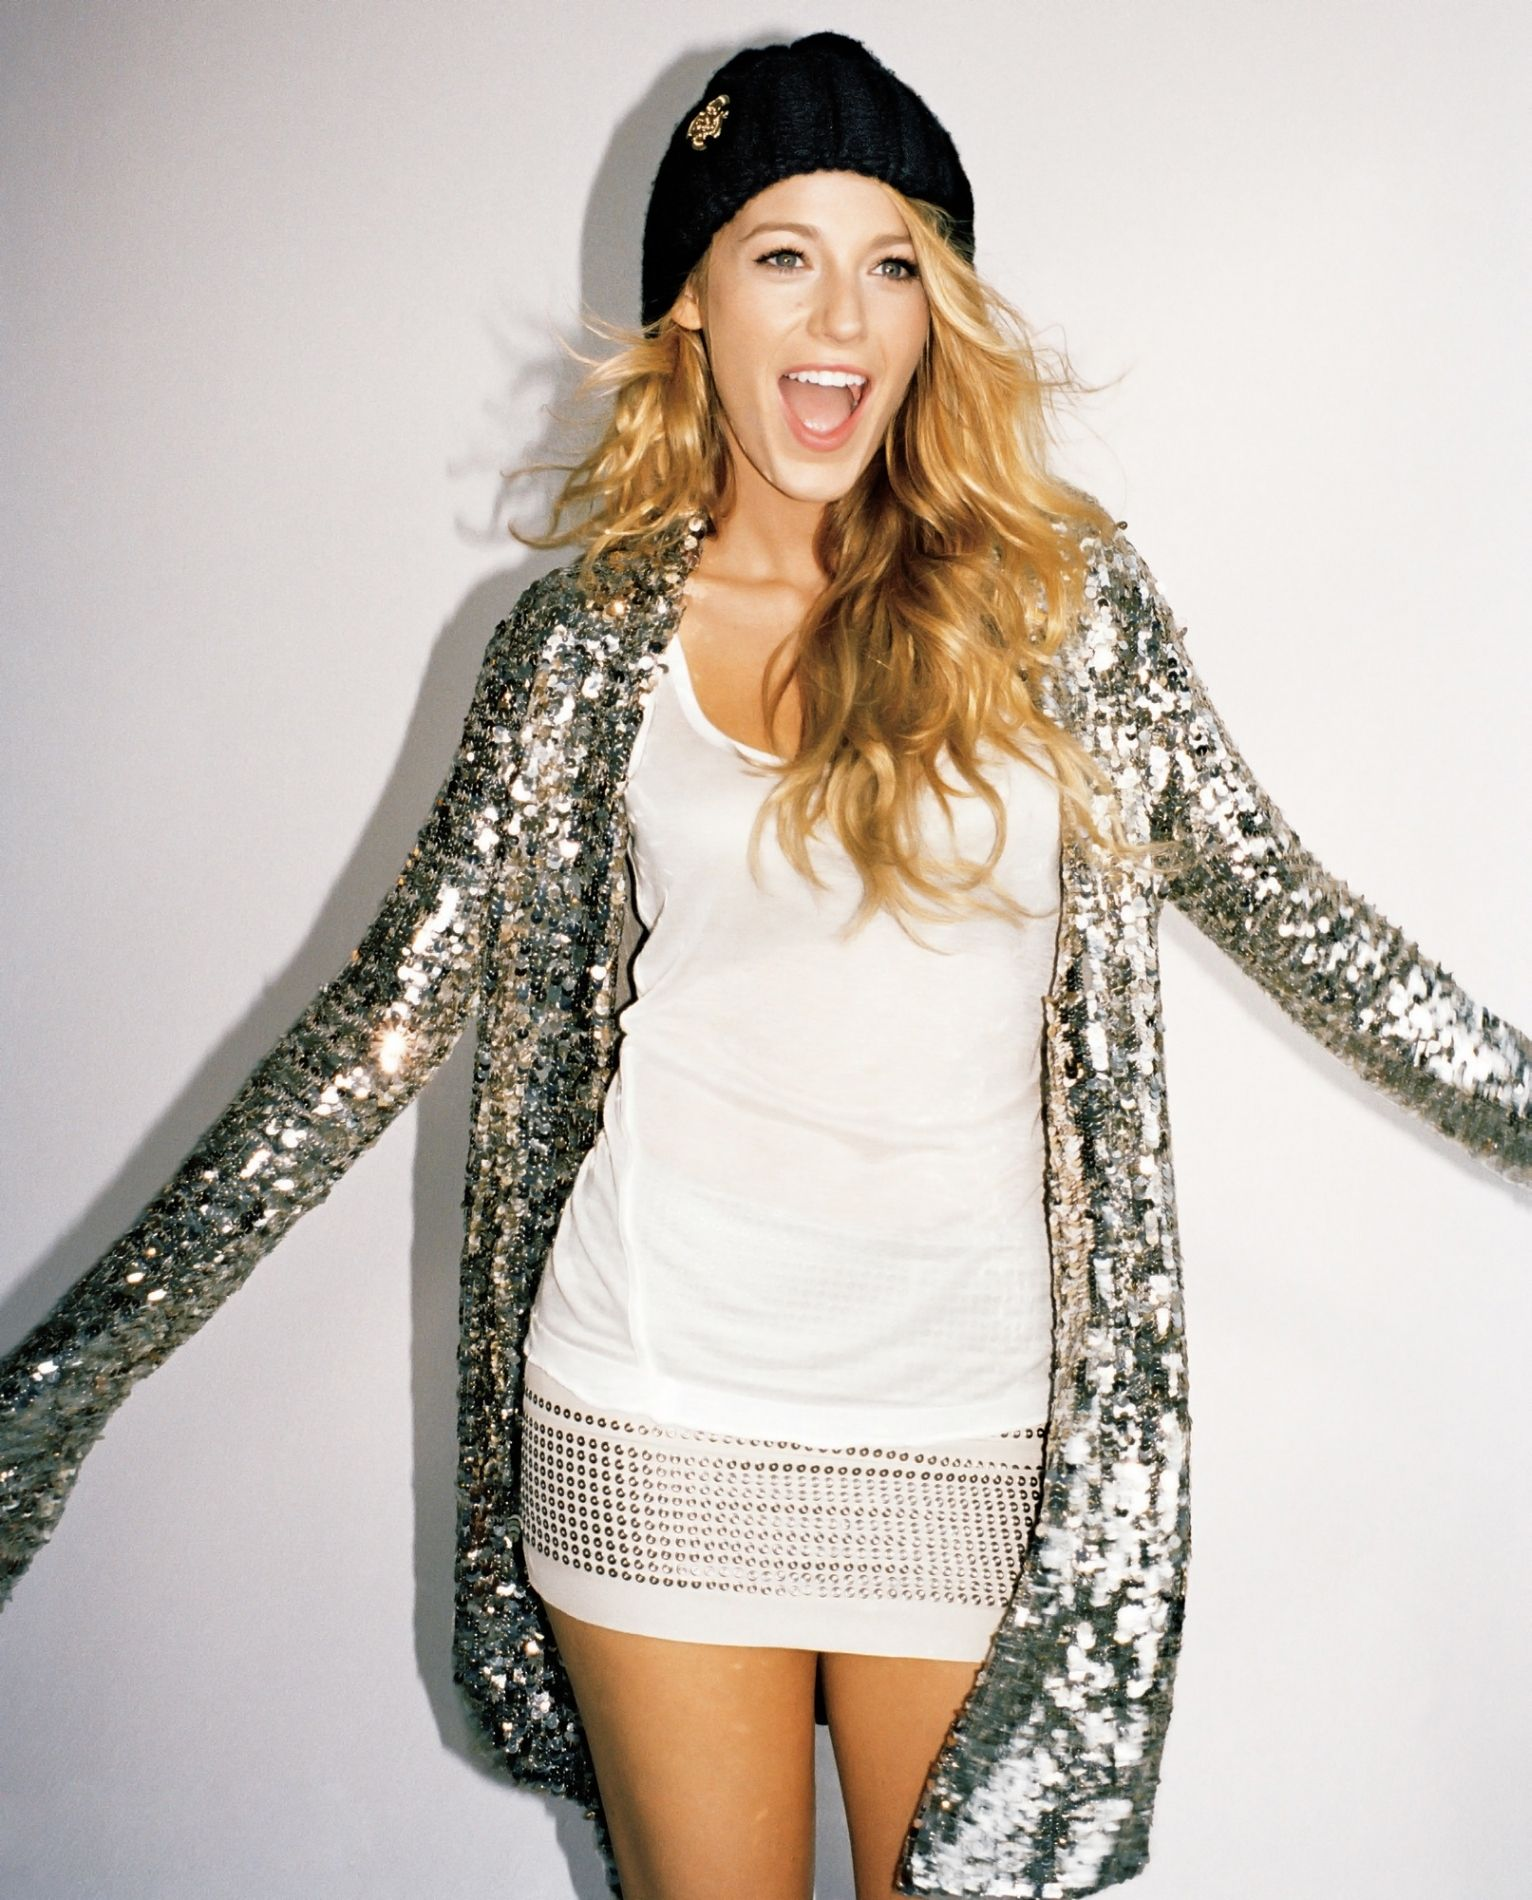 Blake Lively | Women | Pinterest | Blake lively, Fashion and Celebrity